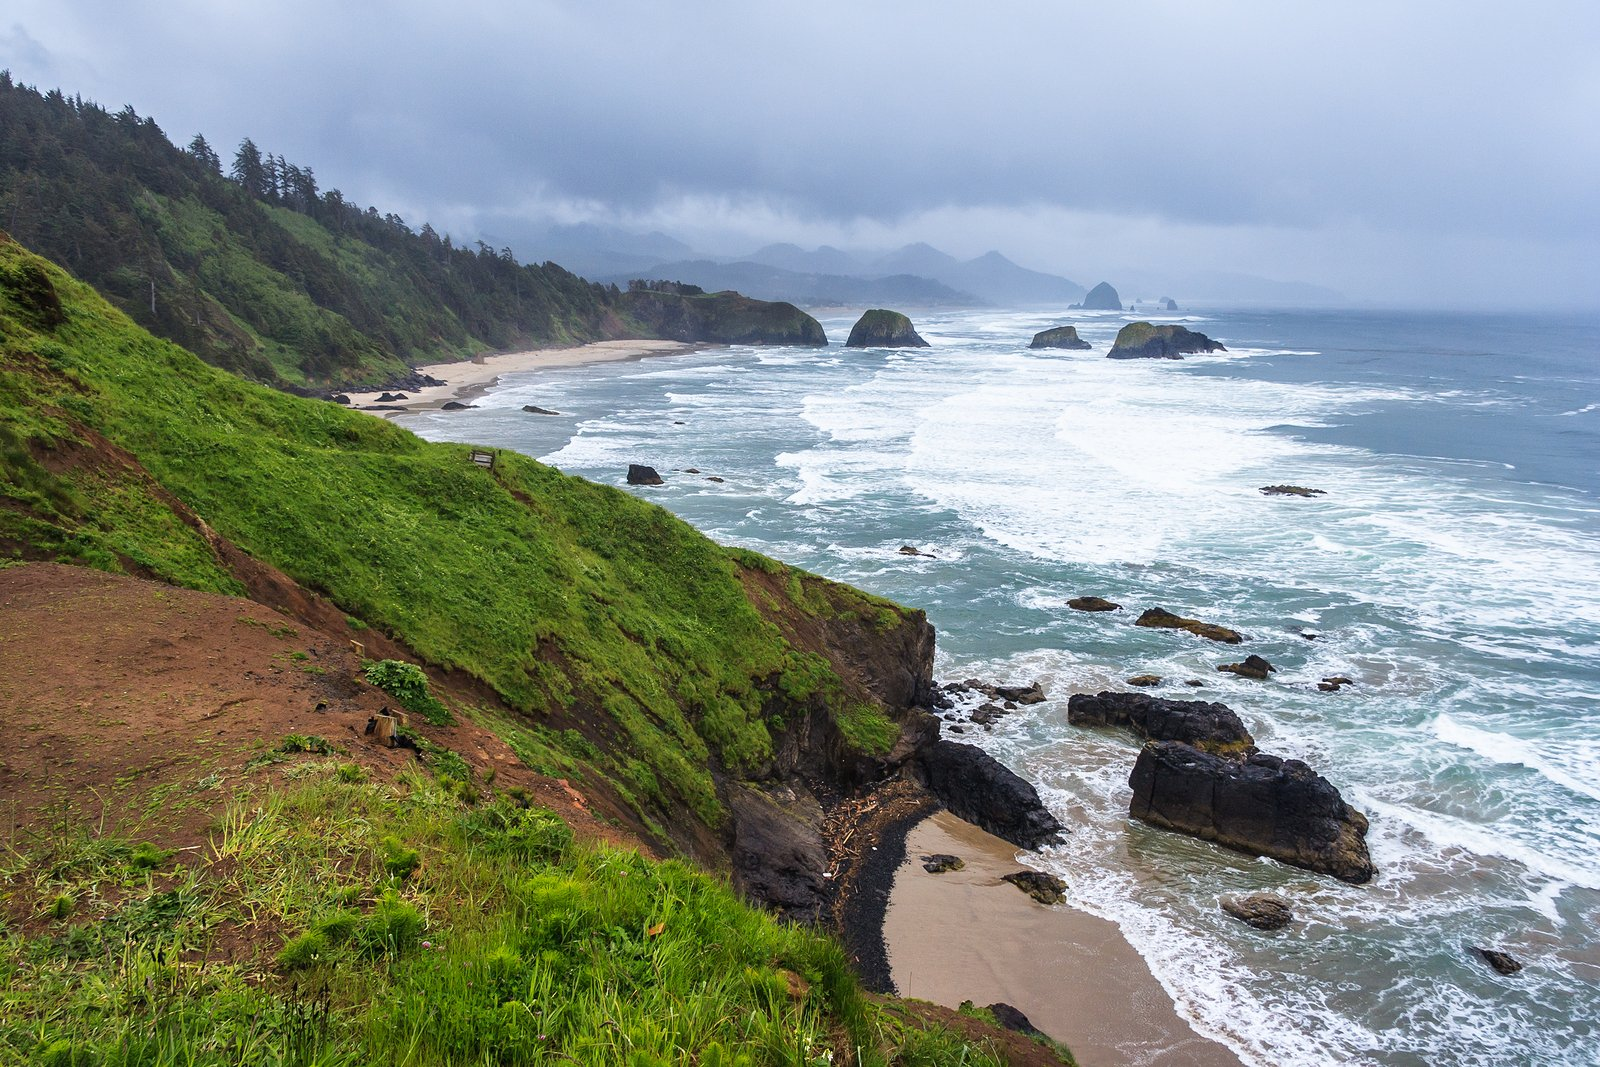 Crescent Beach near Cannon Beach Oregon